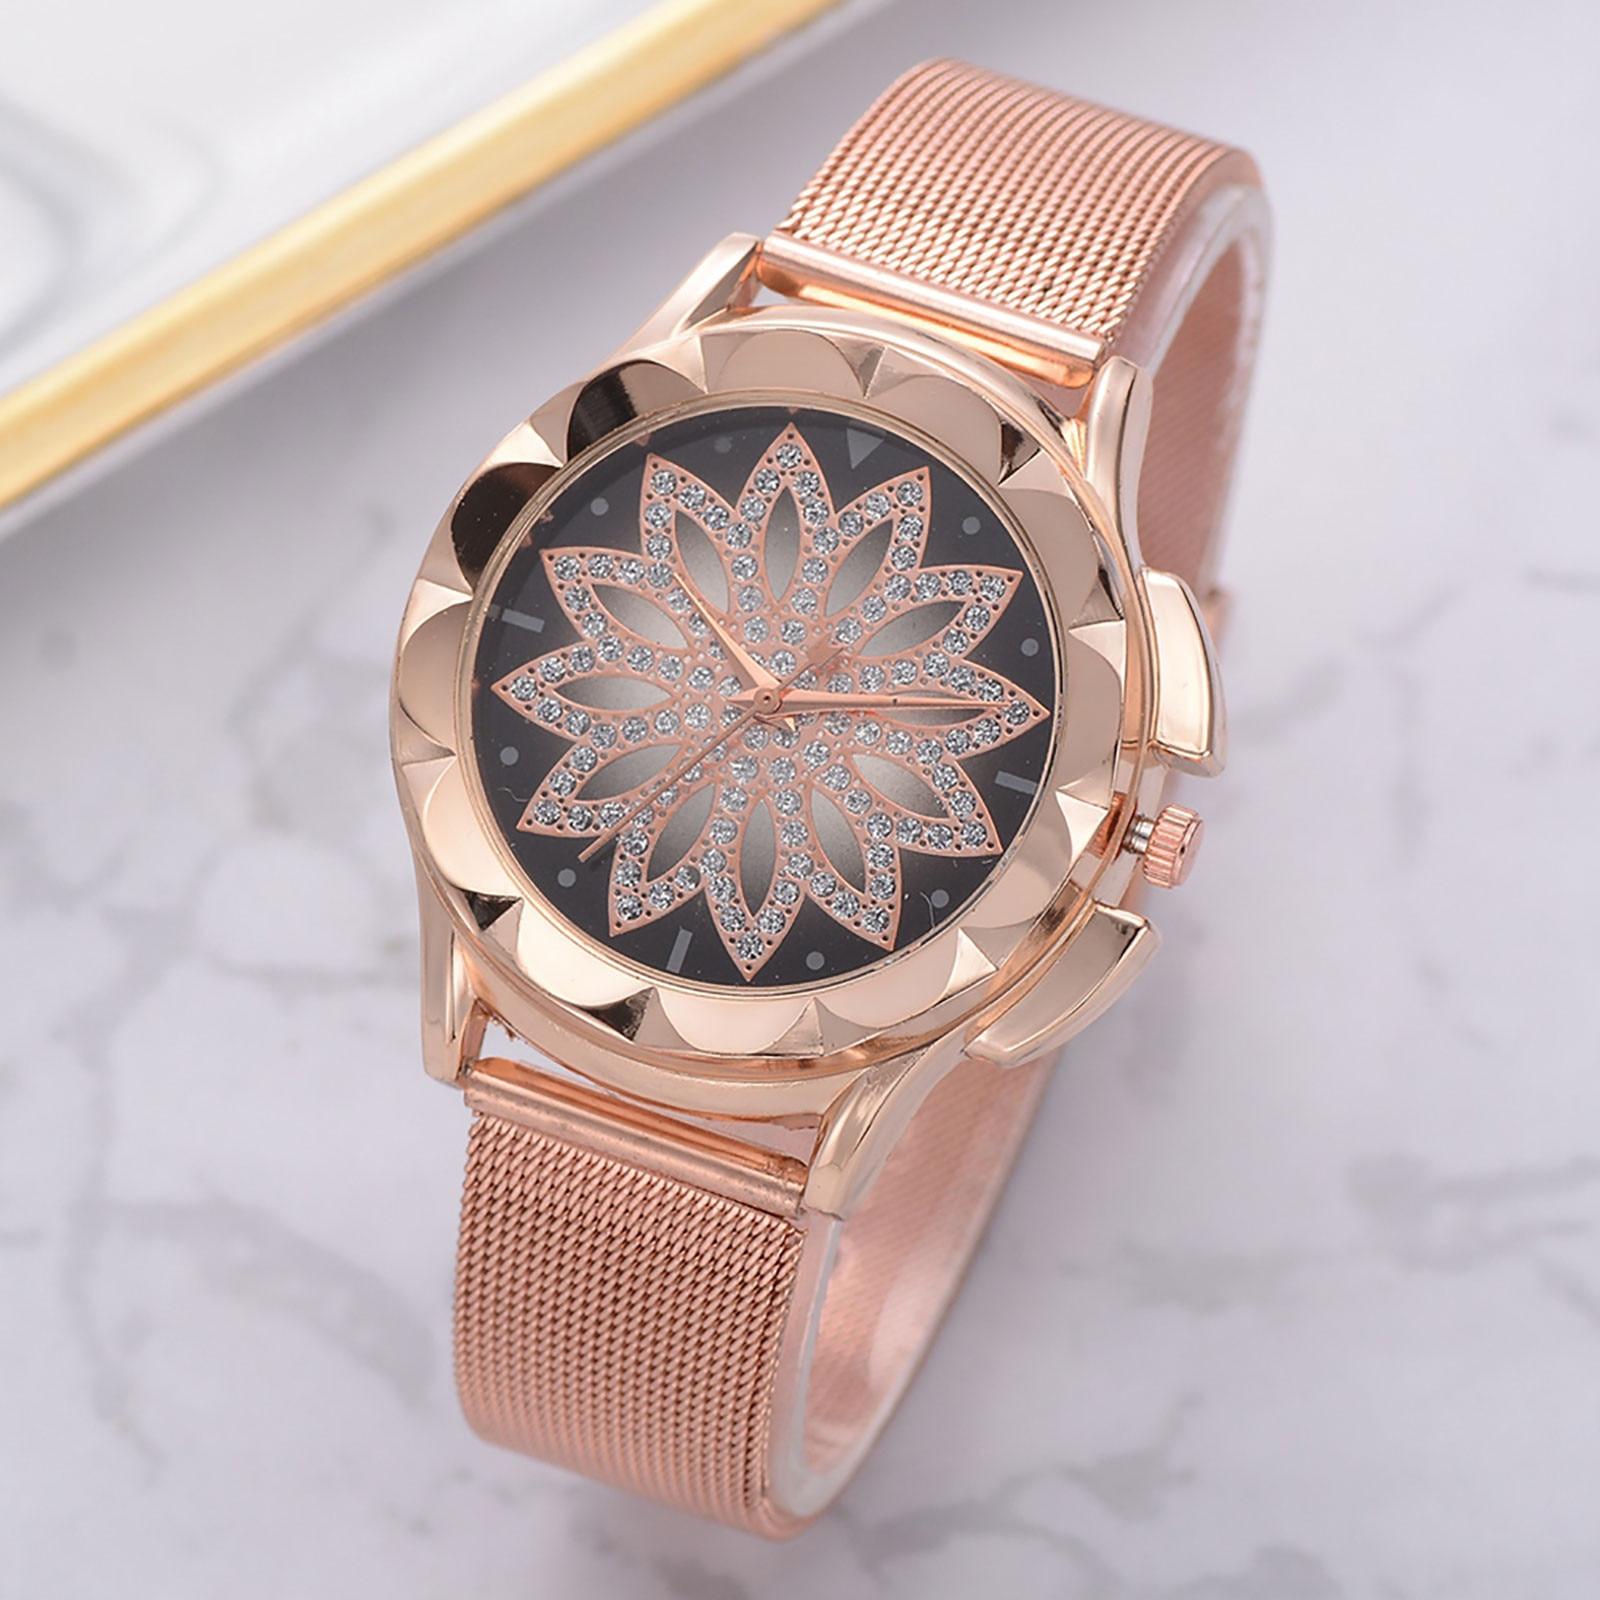 Occident Fashion Models Luxury Spin Good Luck Ladies Quartz Watches Stainless Steel Mesh Belt Watches Women Fashion Watch 2021